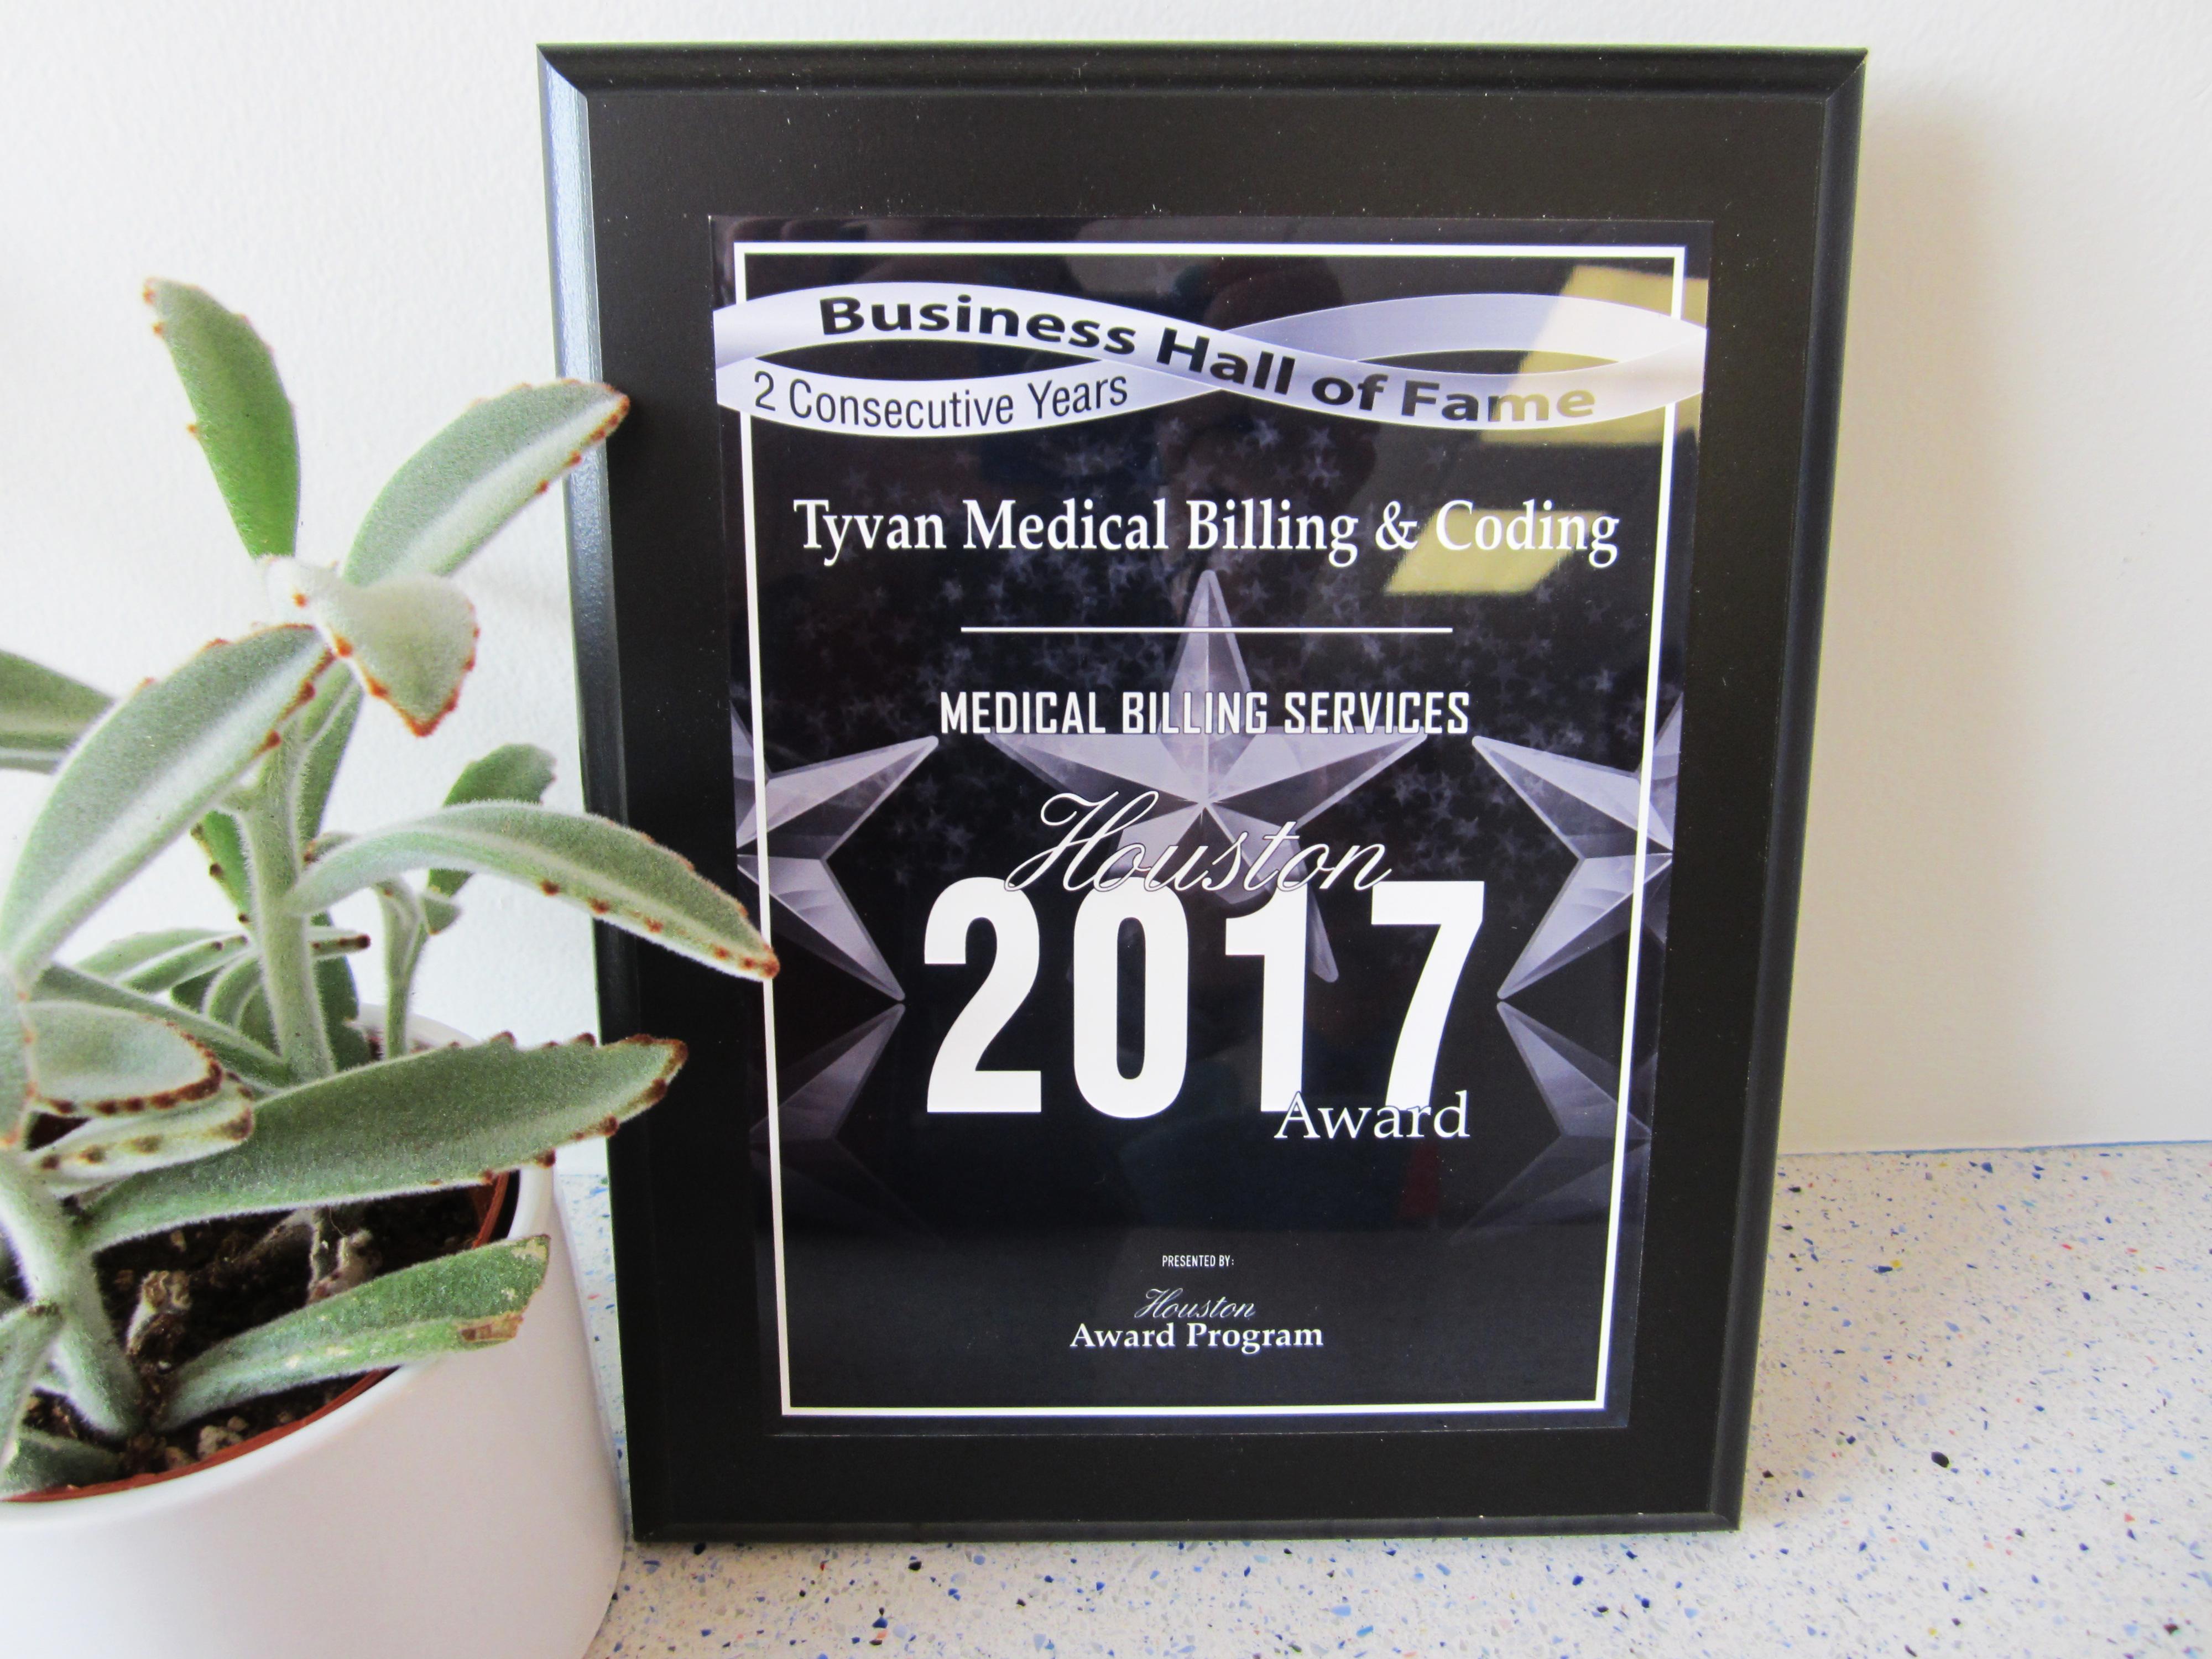 best-company-medical-billing-tyvan